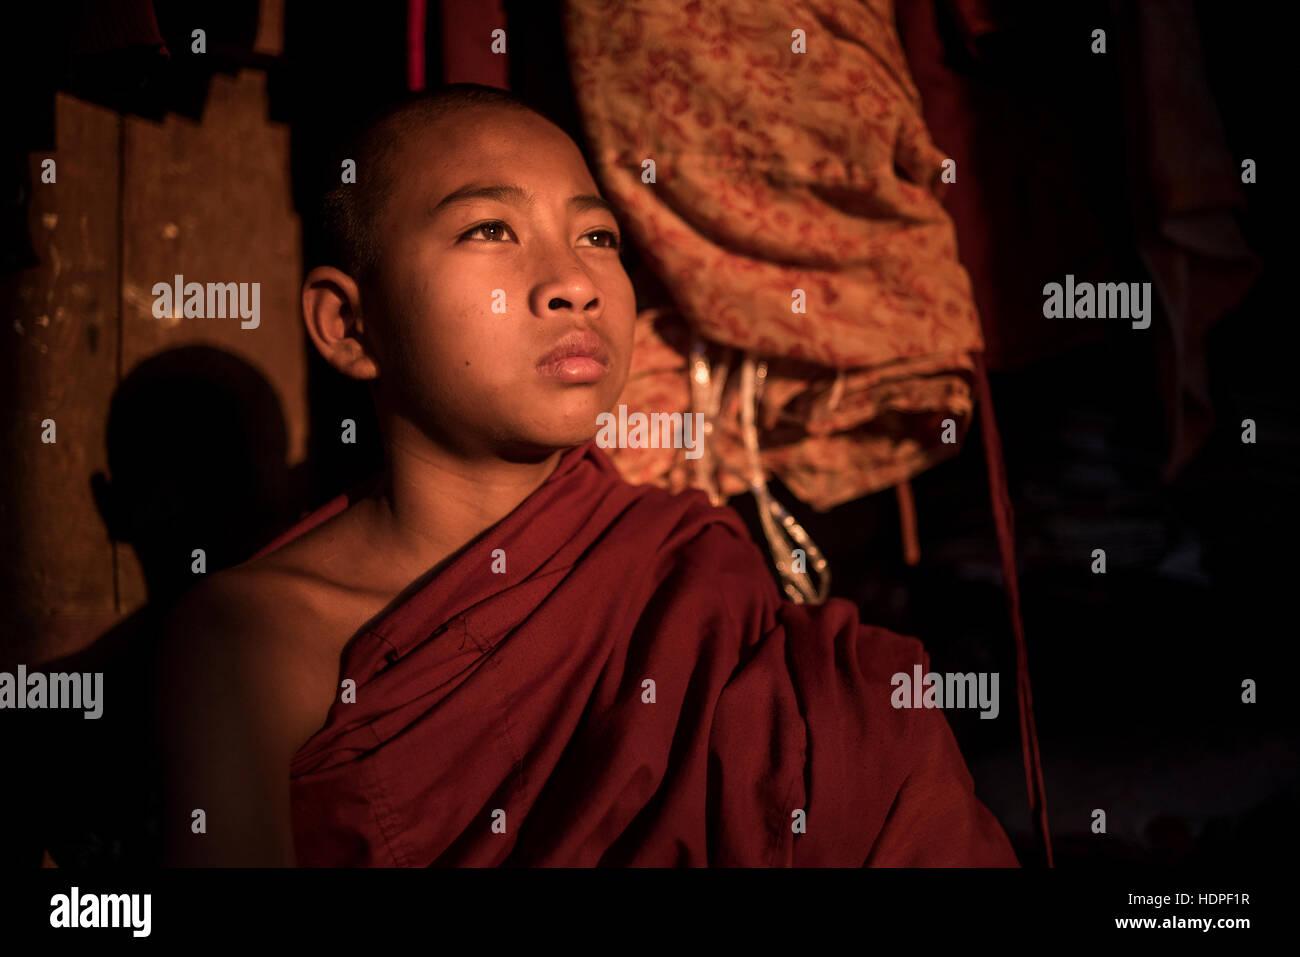 Ritratto di un giovane debuttante monaco buddista, Shwe Yan Pyay Monastero, Nyaungshwe, Myanmar. Immagini Stock